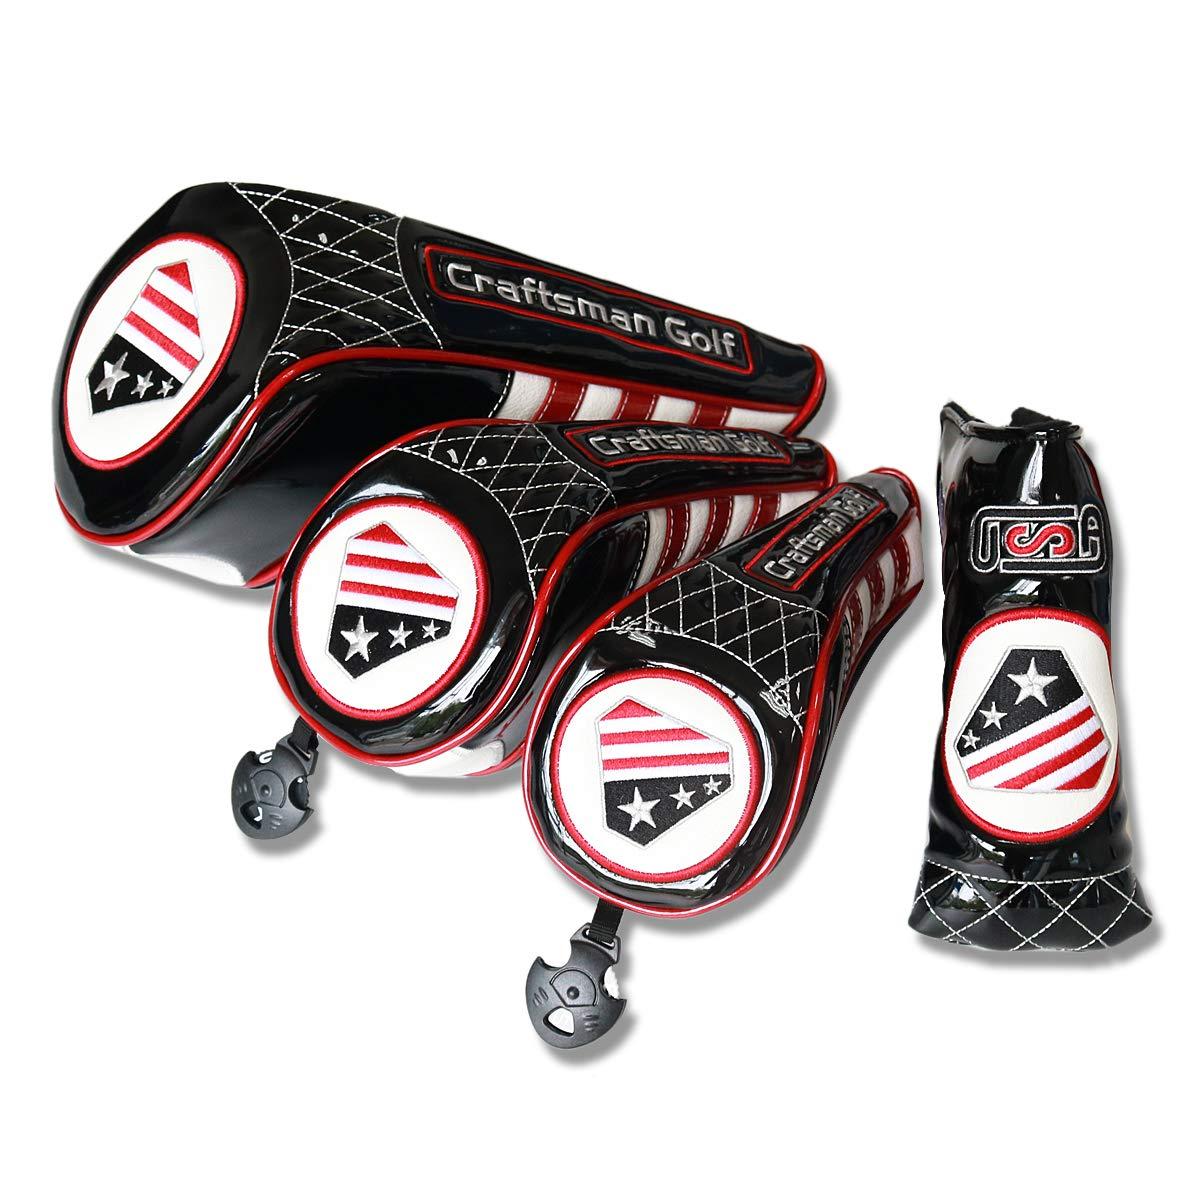 Craftsman Golfアメリカフラグブラックドライバーヘッドカバーフェアウェイウッド用ヘッドカバーハイブリッドRescure UT Covers For Taylormade Callaway Ping g25 Zipper Closure B07G5G3B59